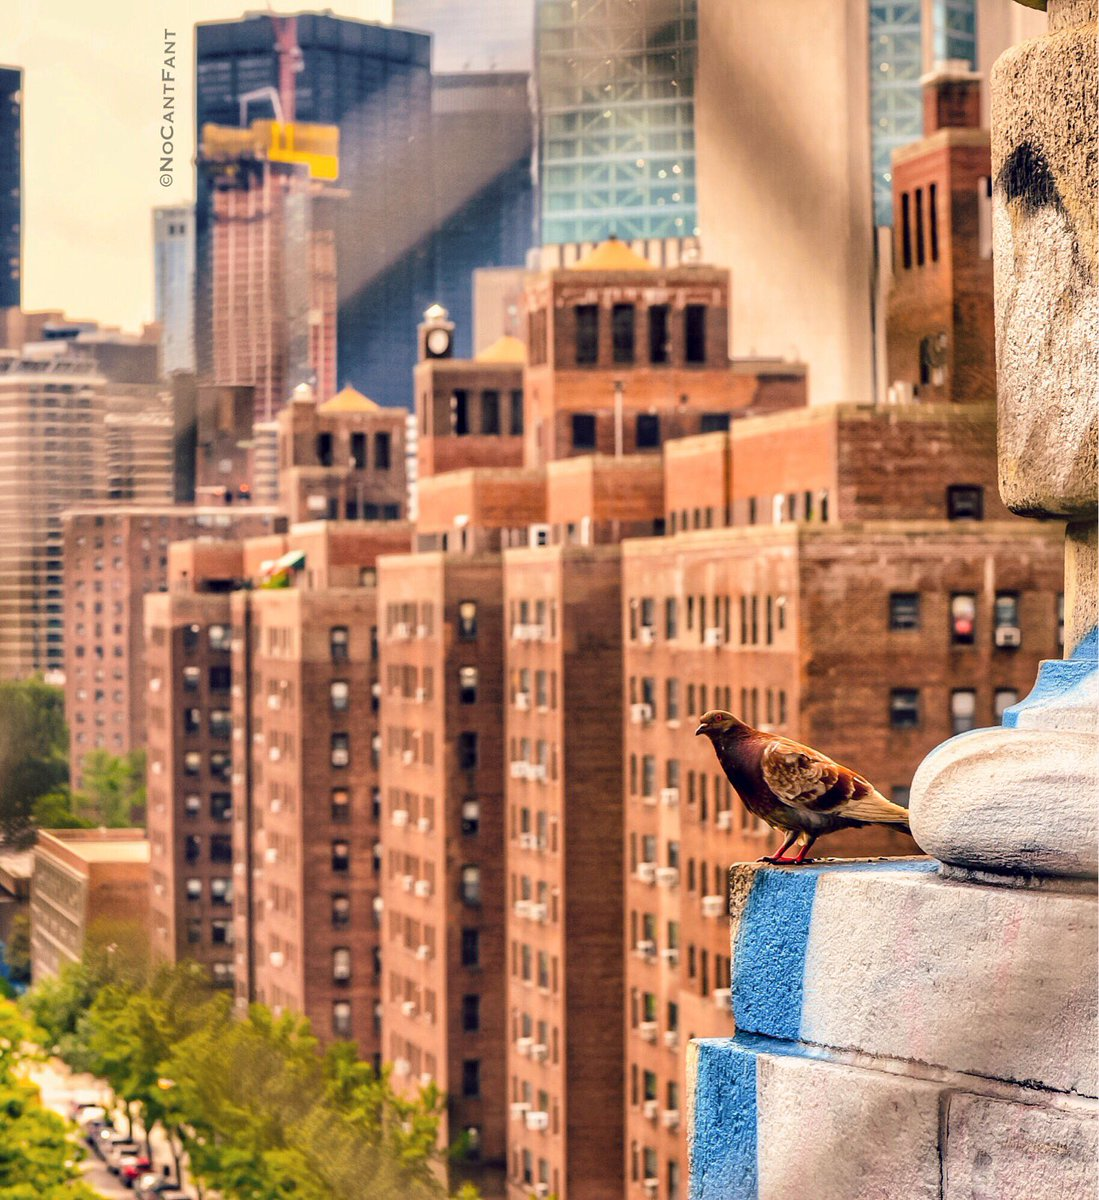 *Watch Me Fly*Create Your World! #Nomad #Freebird #wanderlust #youtuber #birdview #NewYorkCity #NewYork #NoCantFant #Something4thepeople <br>http://pic.twitter.com/zRfToLKoXq